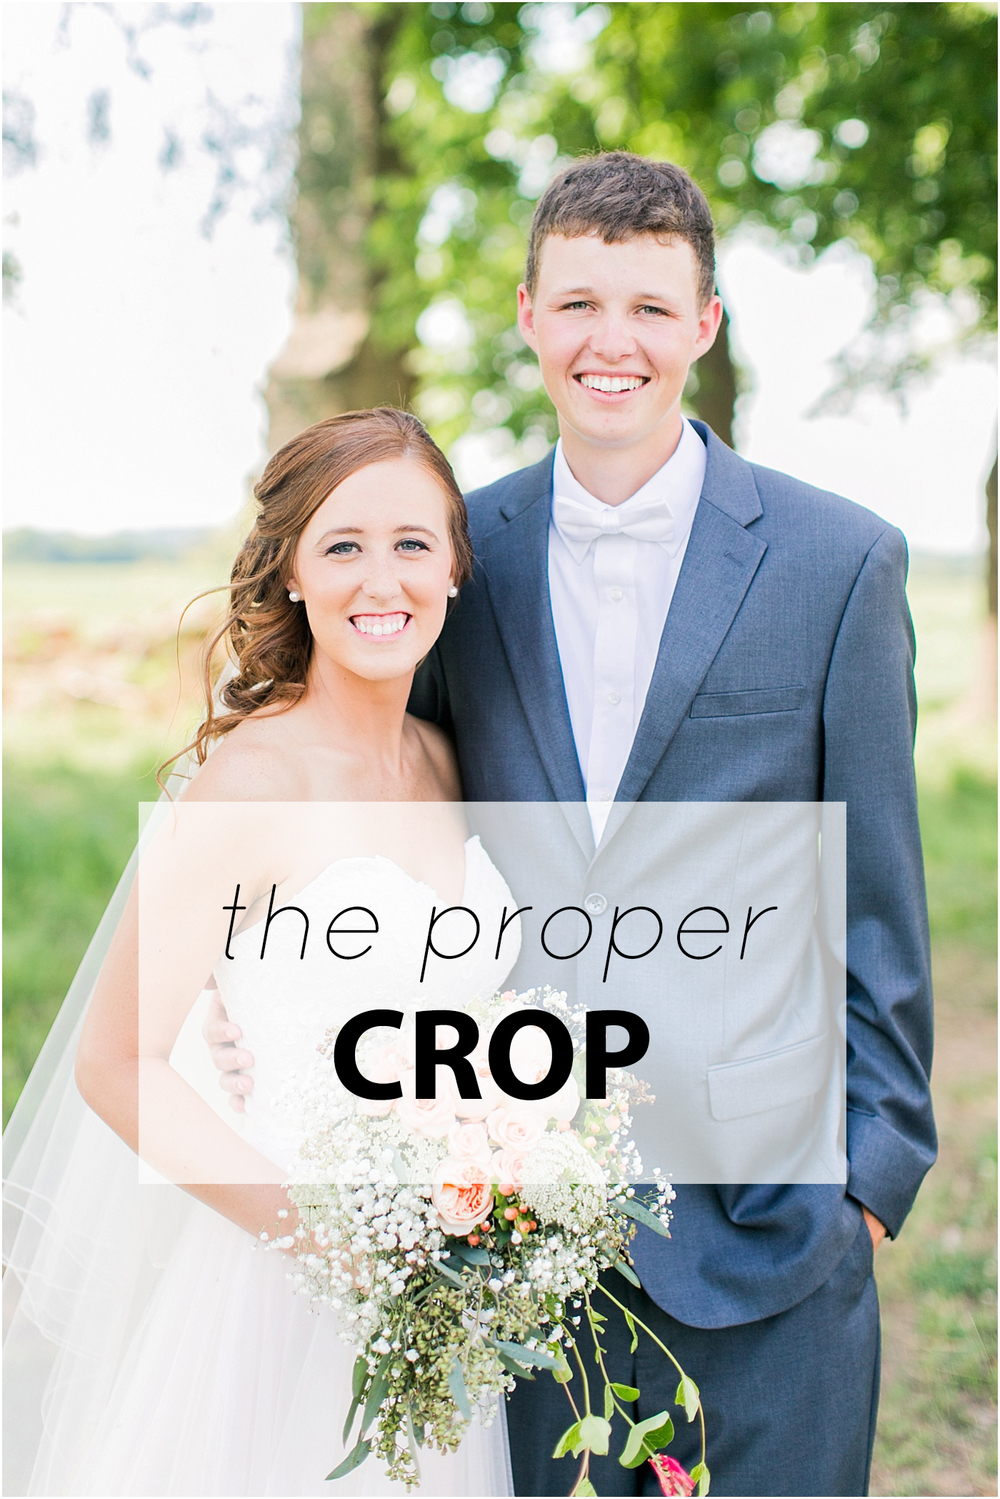 The Propper Crop - The Jordan Brittley Blog (www.jordanbrittleyblog.com)